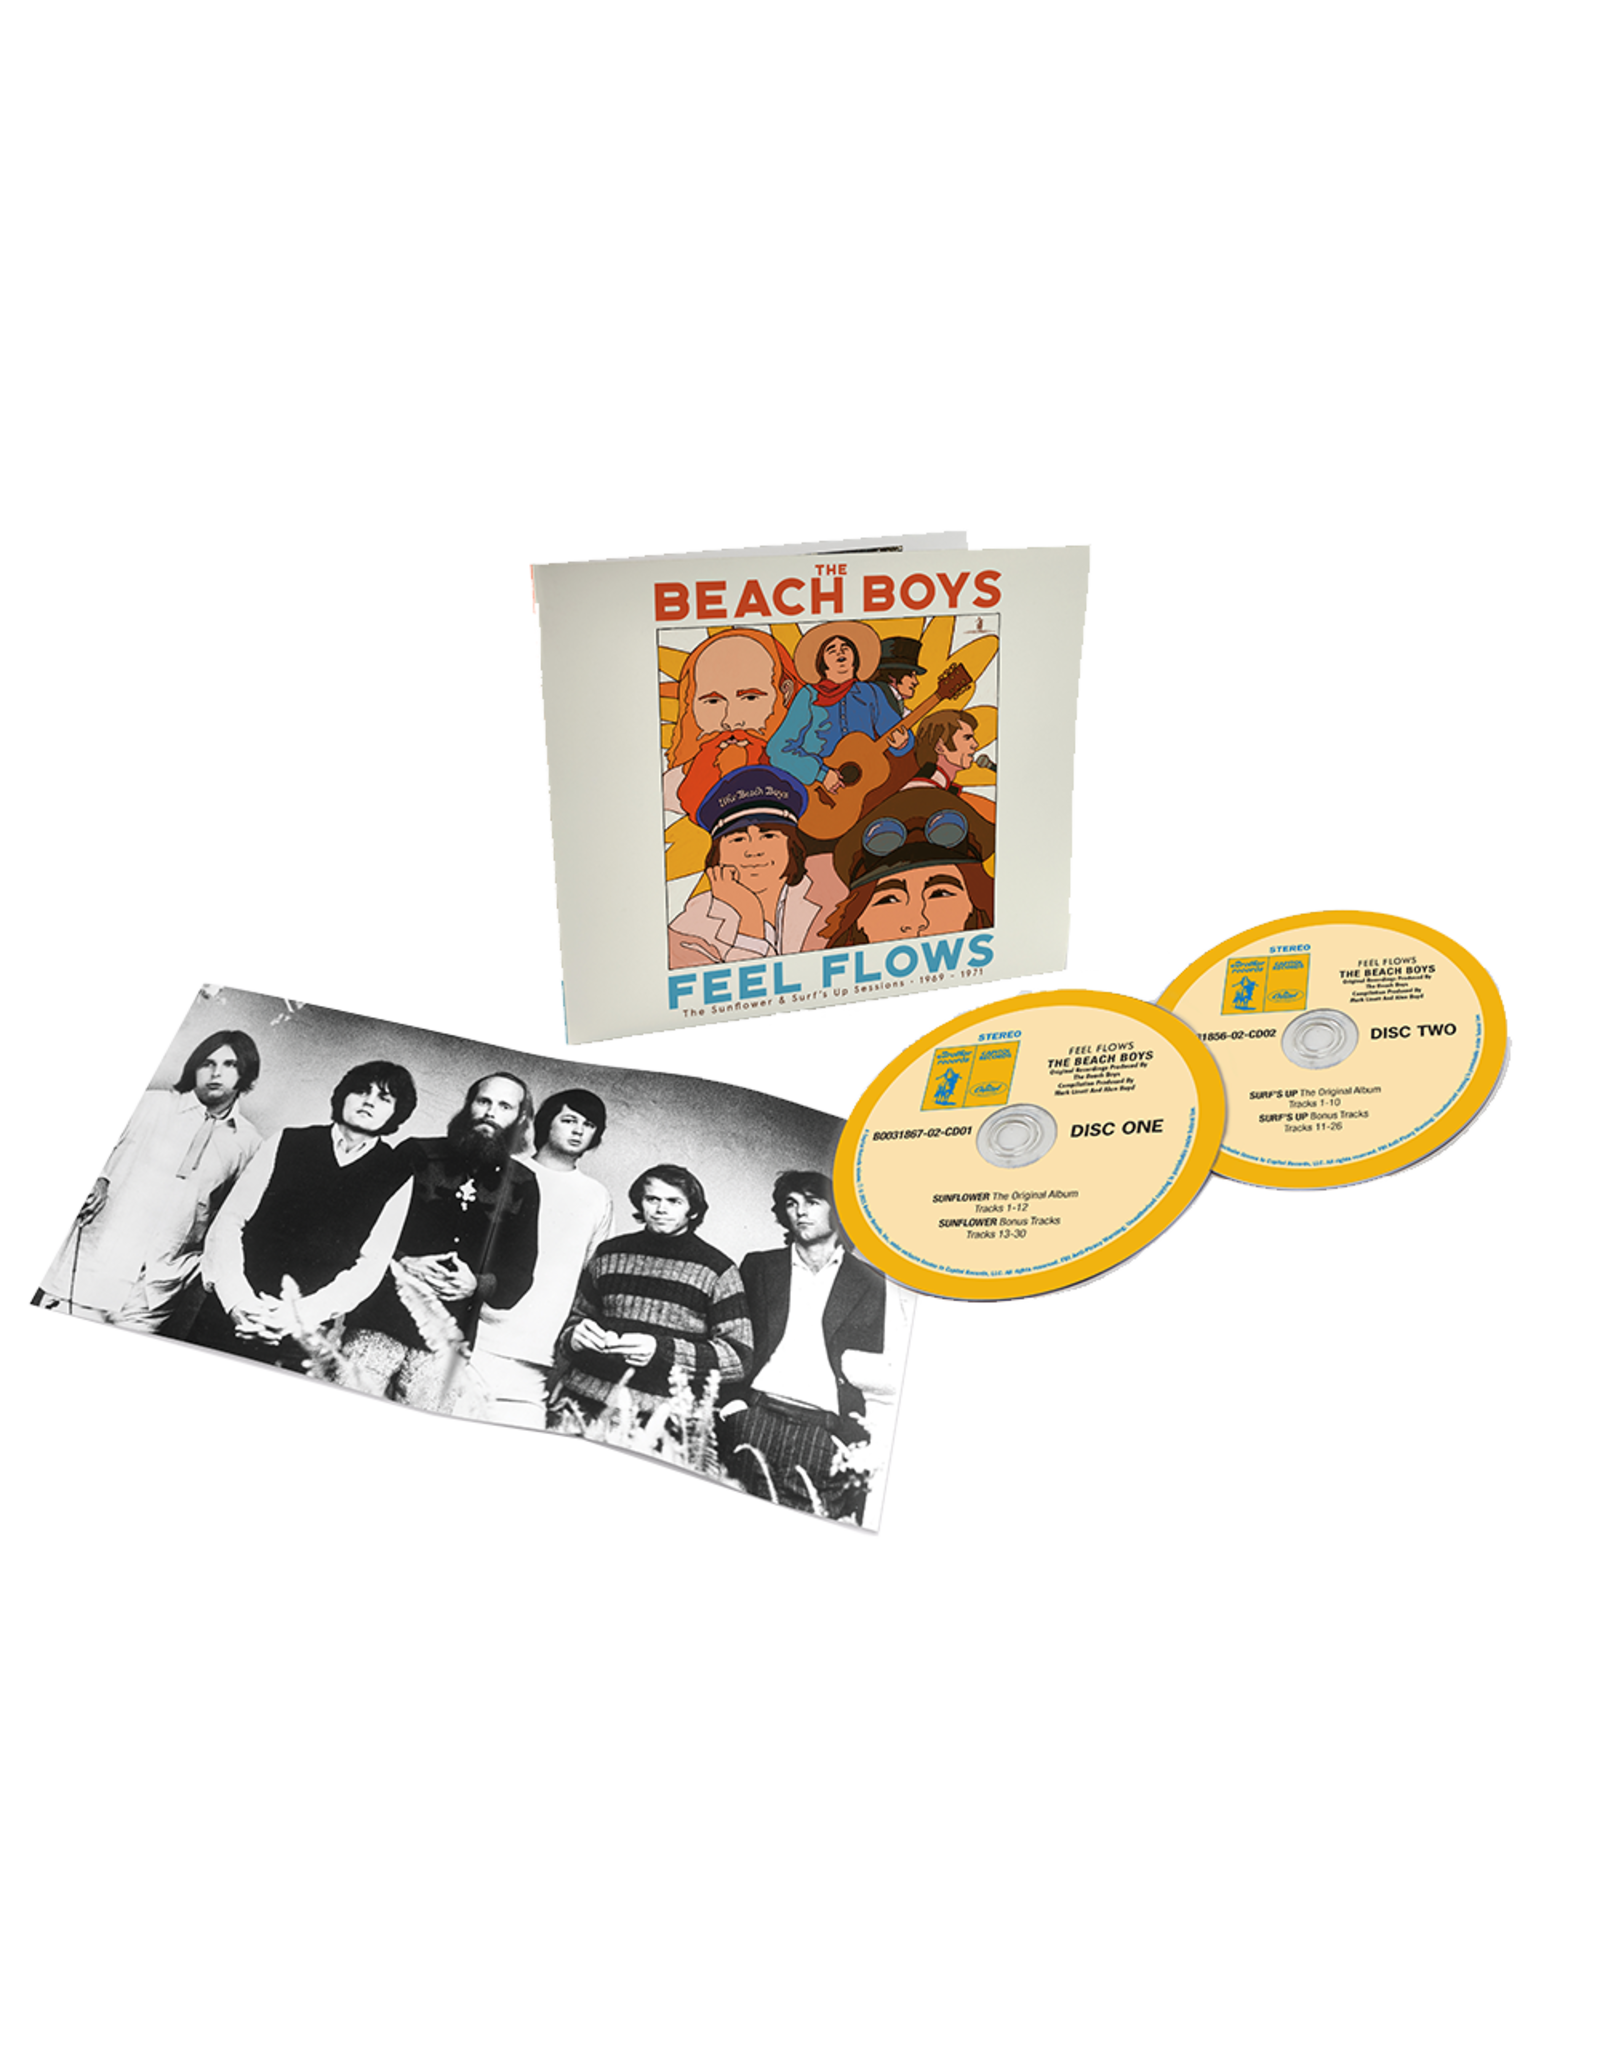 Beach Boys, The - Feel Flows: The Sunflower & Surf's Up Sessions 1969 - 1971 2CD